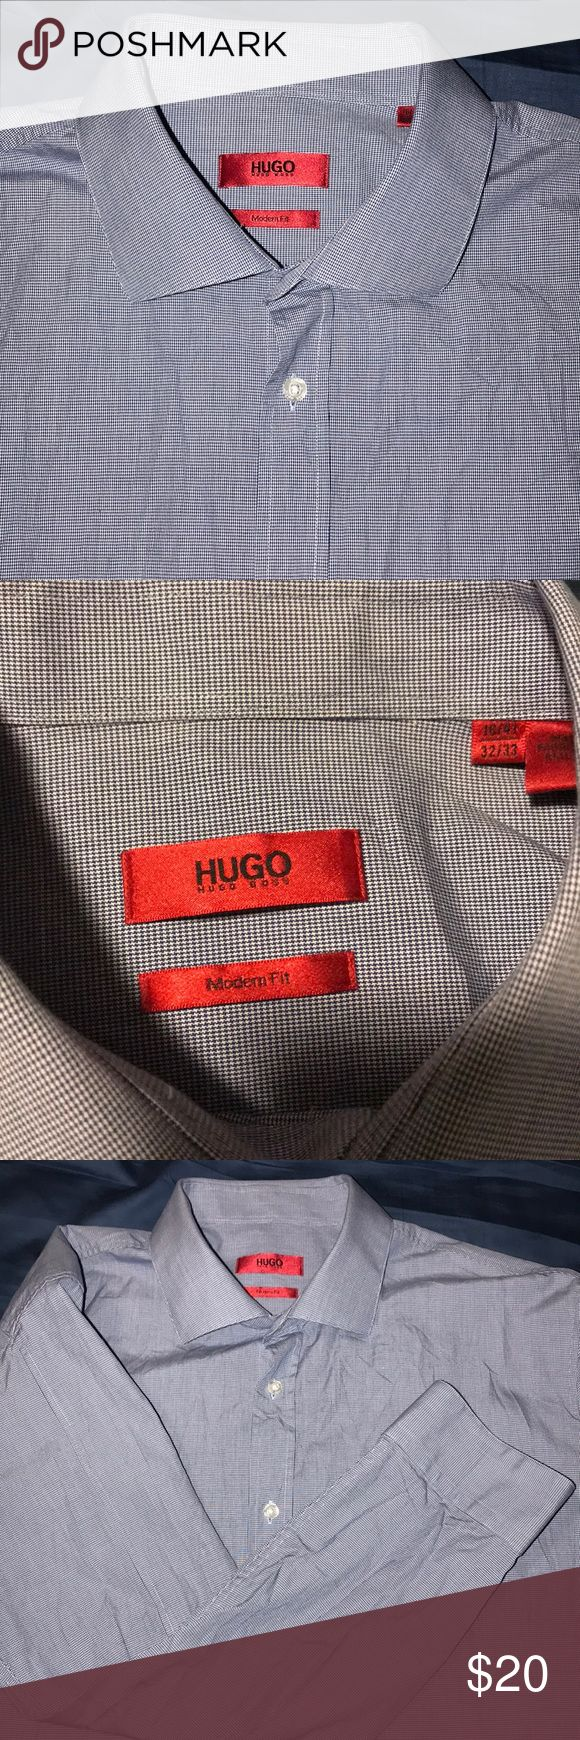 Hugo Boss dress shirt Hugo Boss dress shirt . Never used just washed . Modern Fit  size 18/41- 32/33 Hugo Boss Shirts Dress Shirts